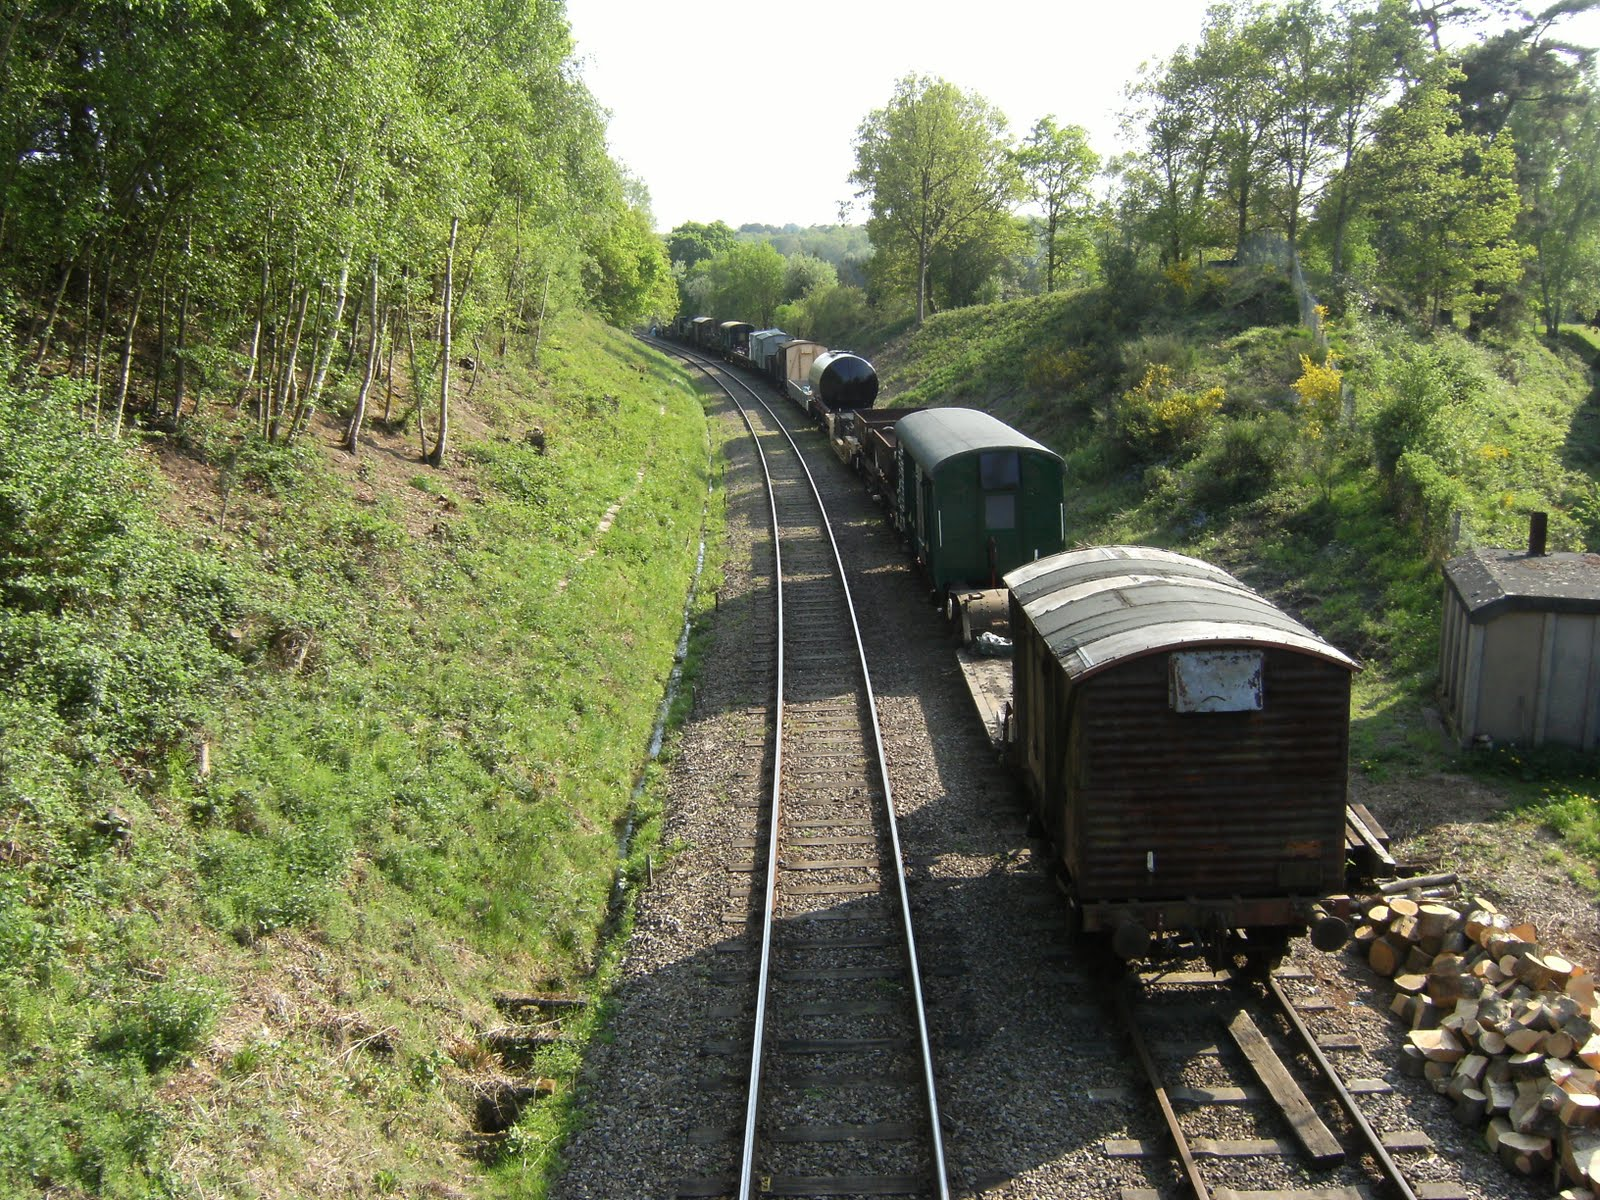 DSCF7492 Spa Valley Railway sidings at Groombridge